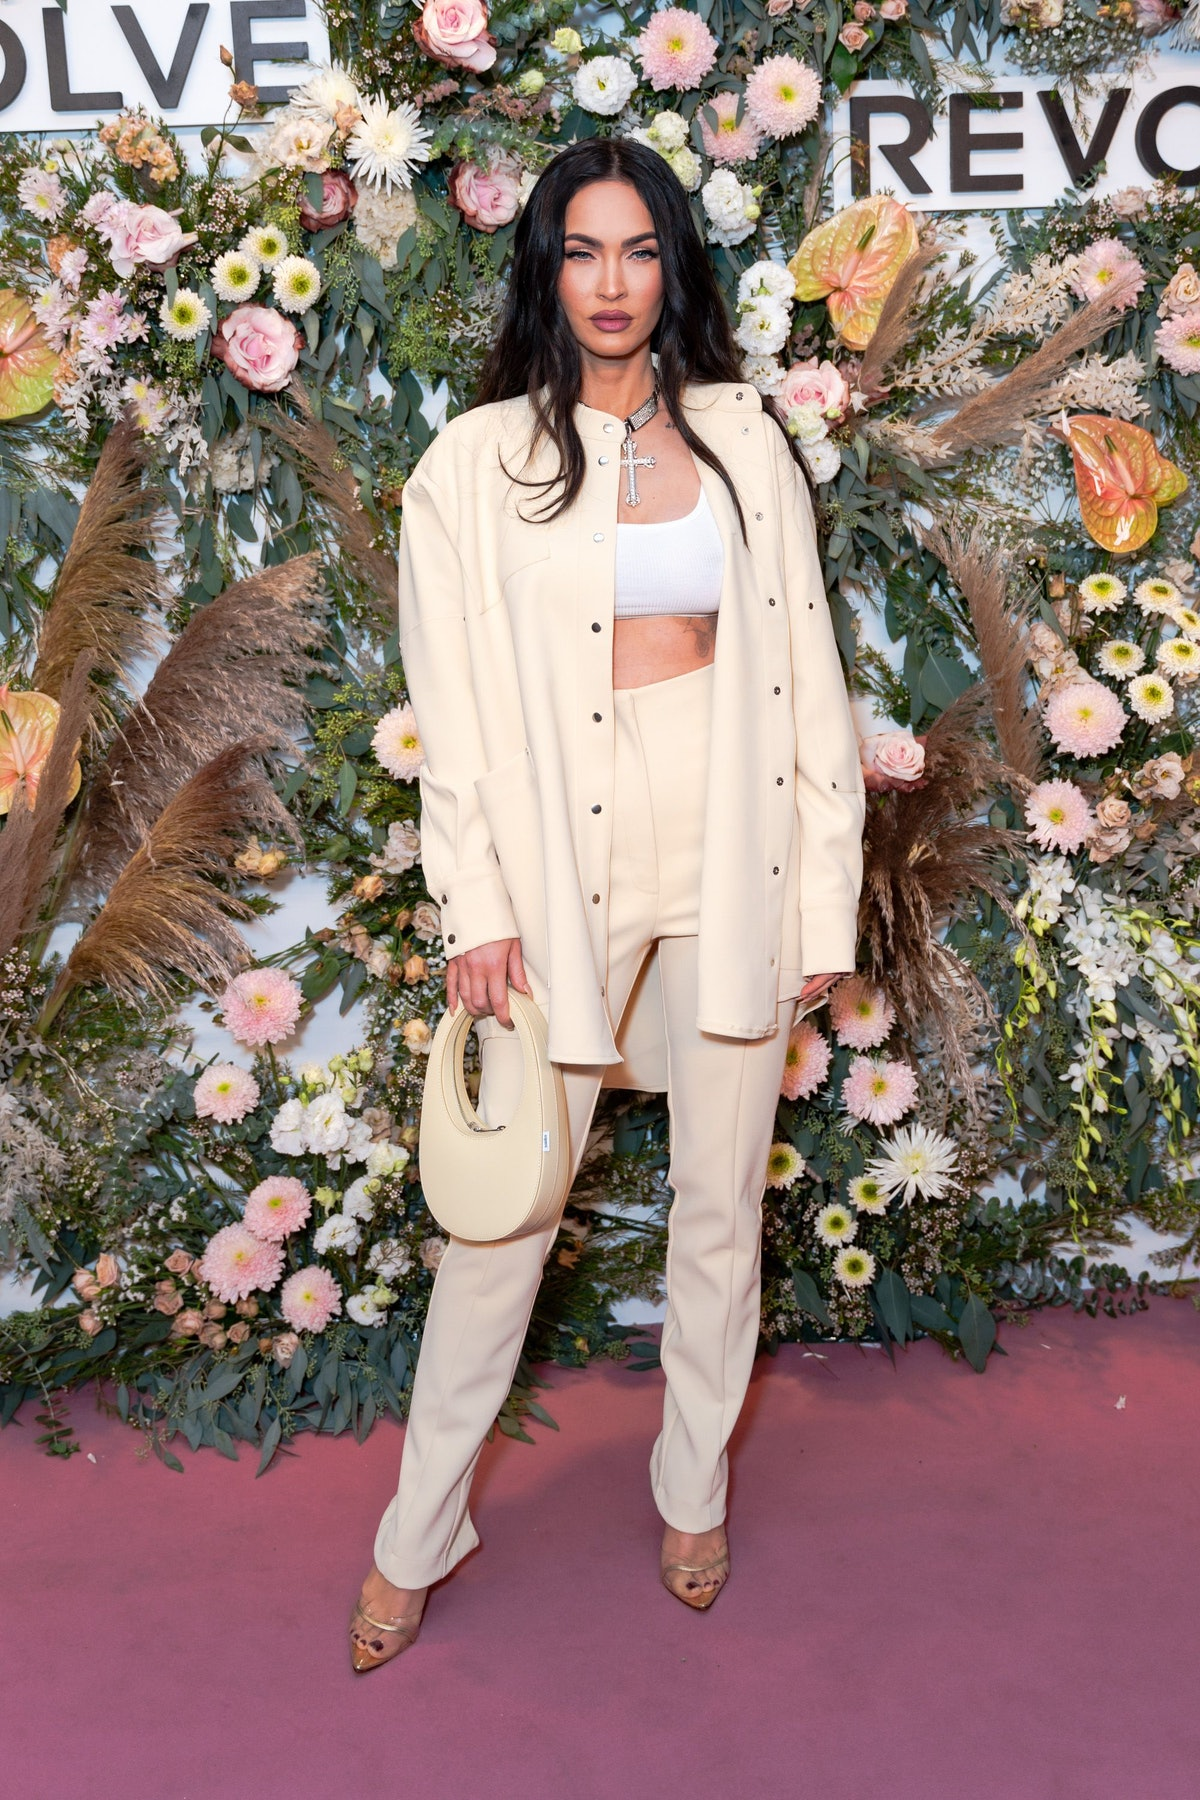 Megan Fox attends the Revolve Gallery at Hudson Yards on September 09, 2021 in New York City.